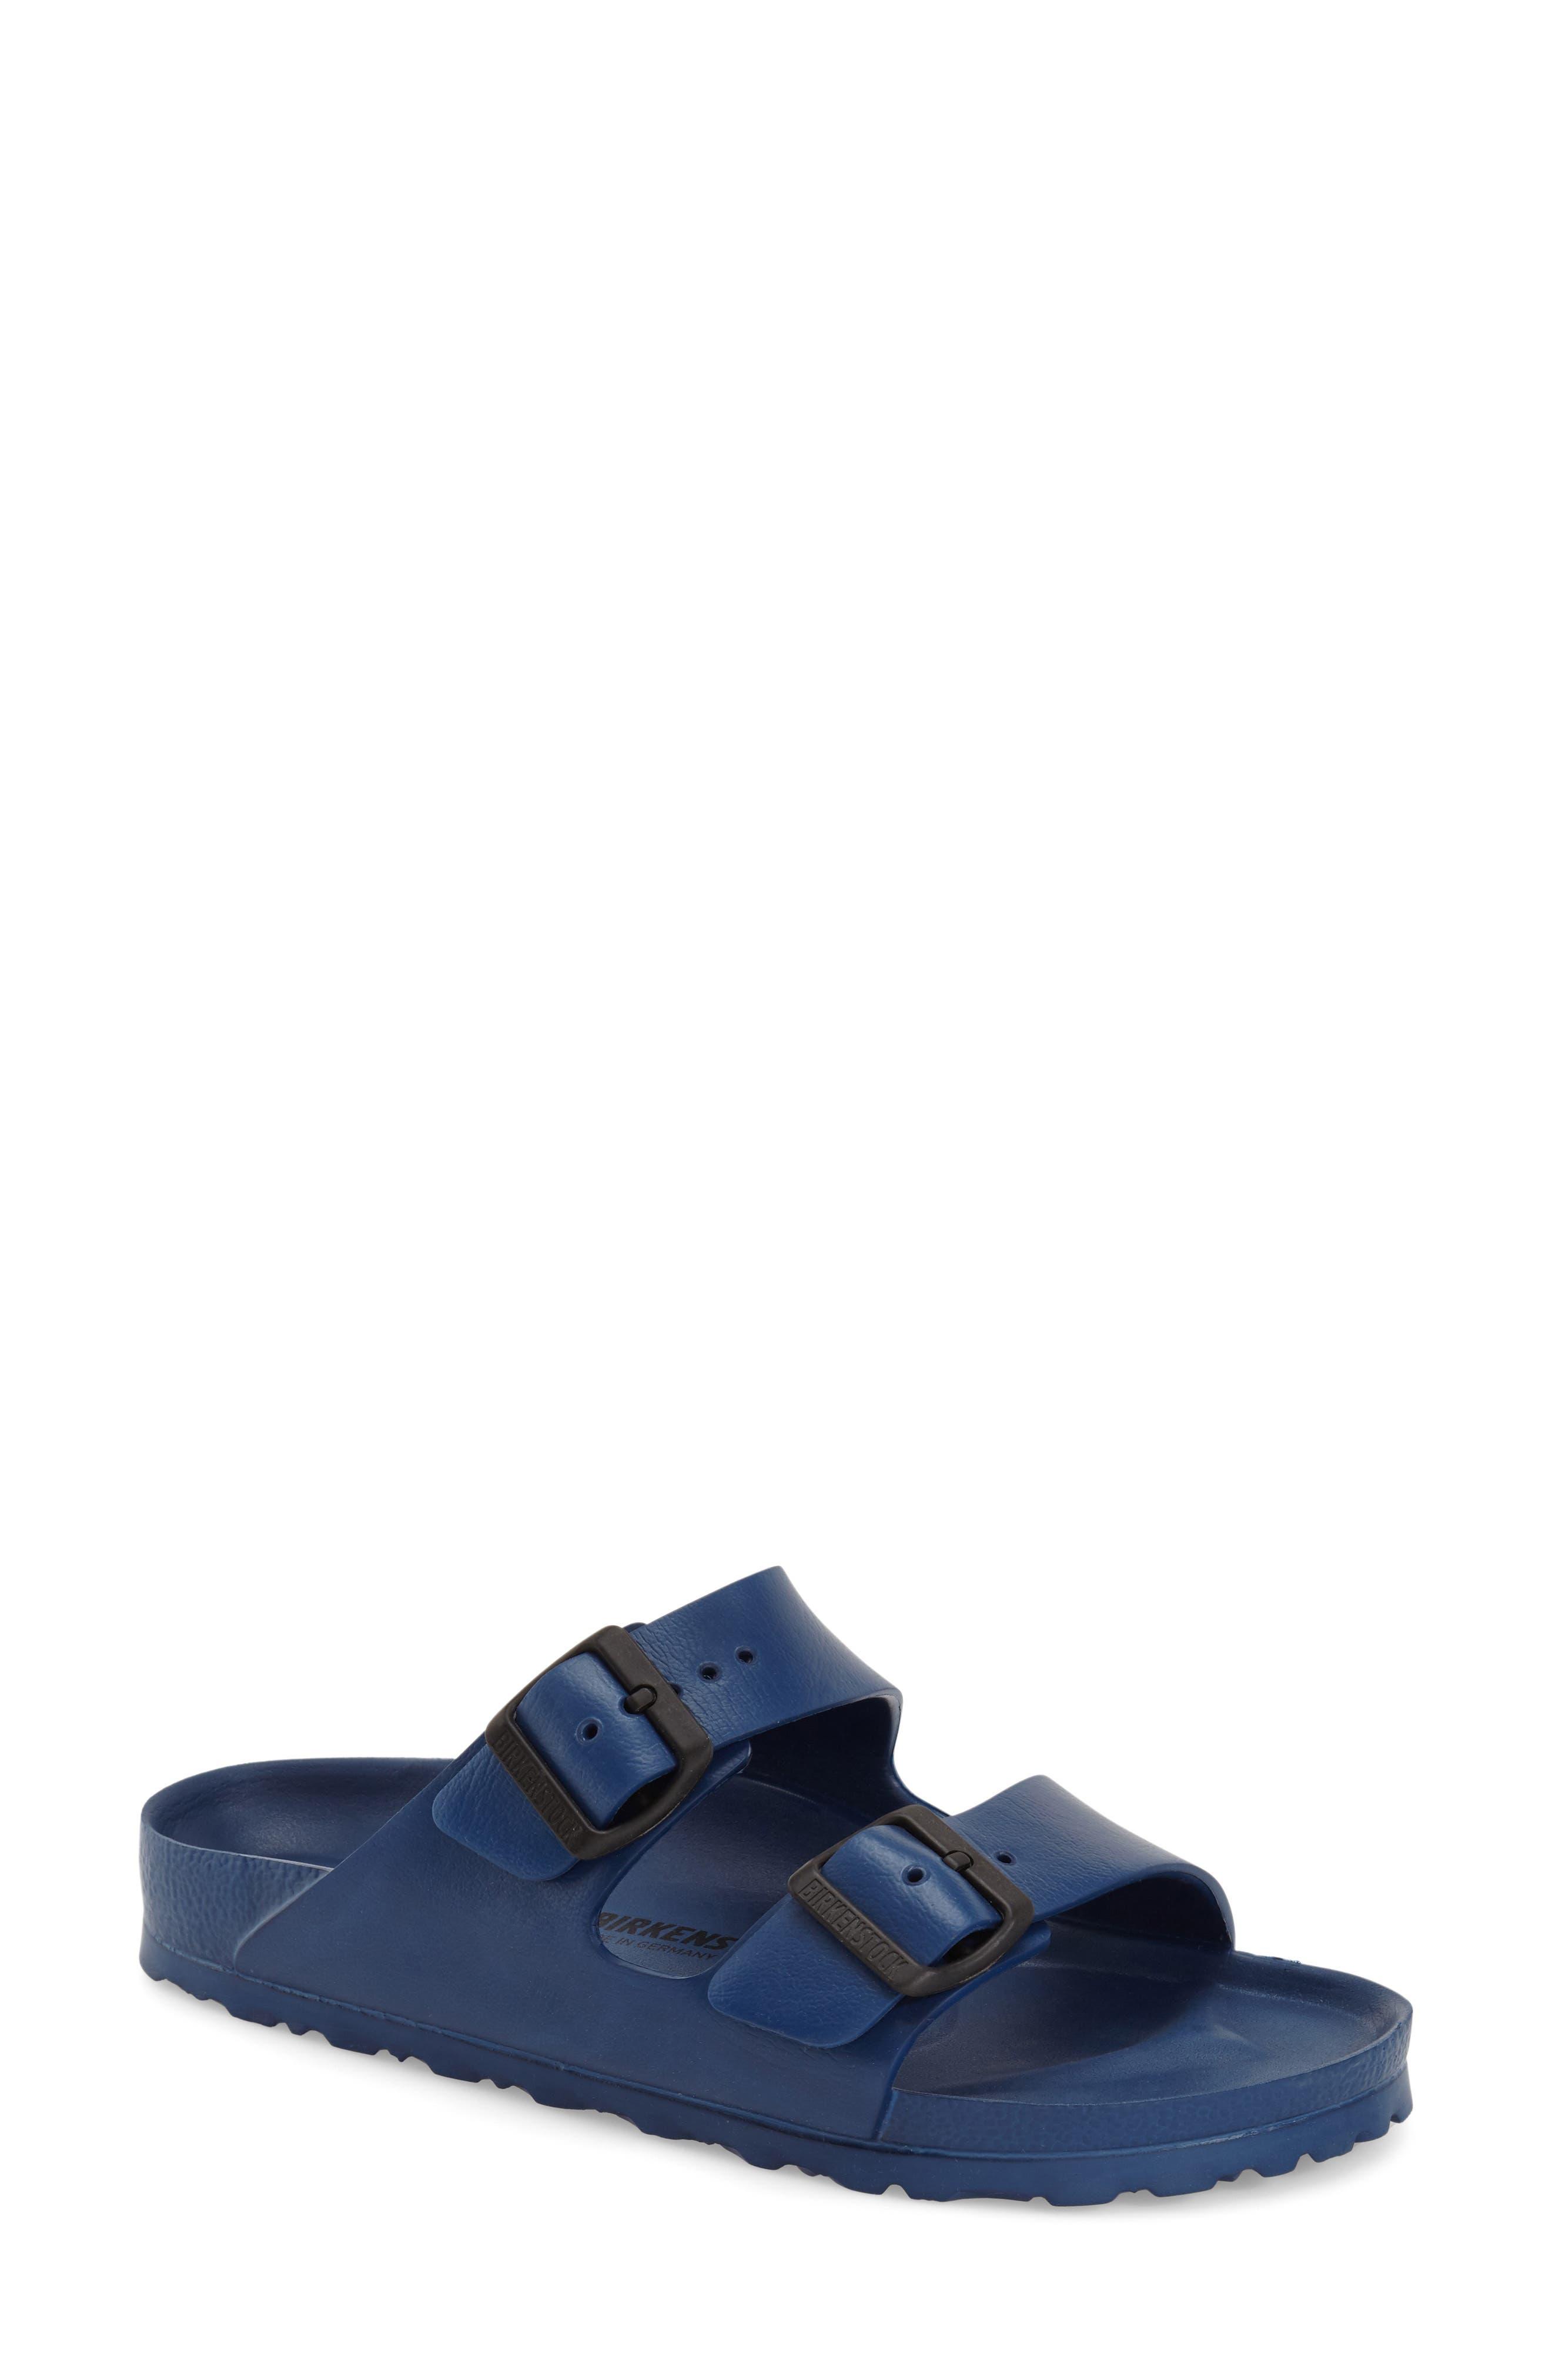 Essentials - Arizona Slide Sandal,                             Main thumbnail 1, color,                             Navy Eva